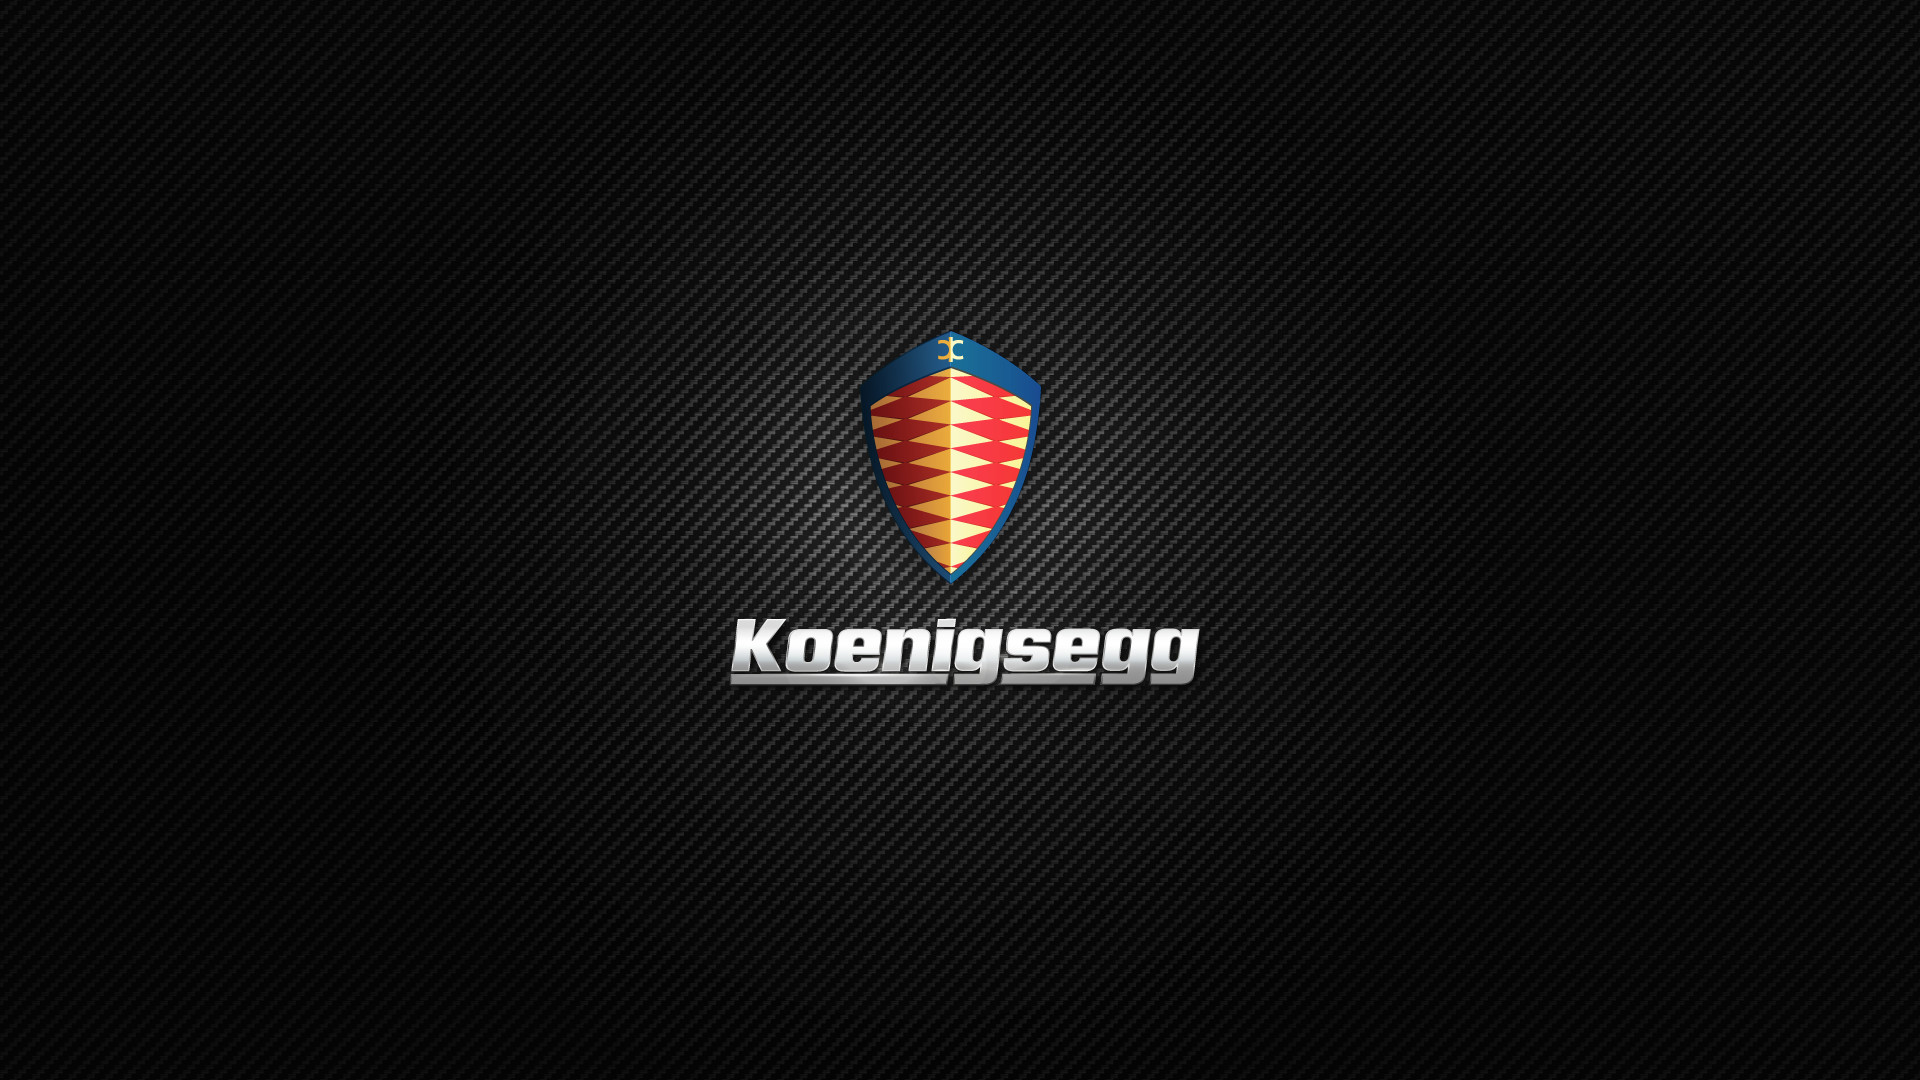 Koenigsegg Logo Wallpaper HD #6800031